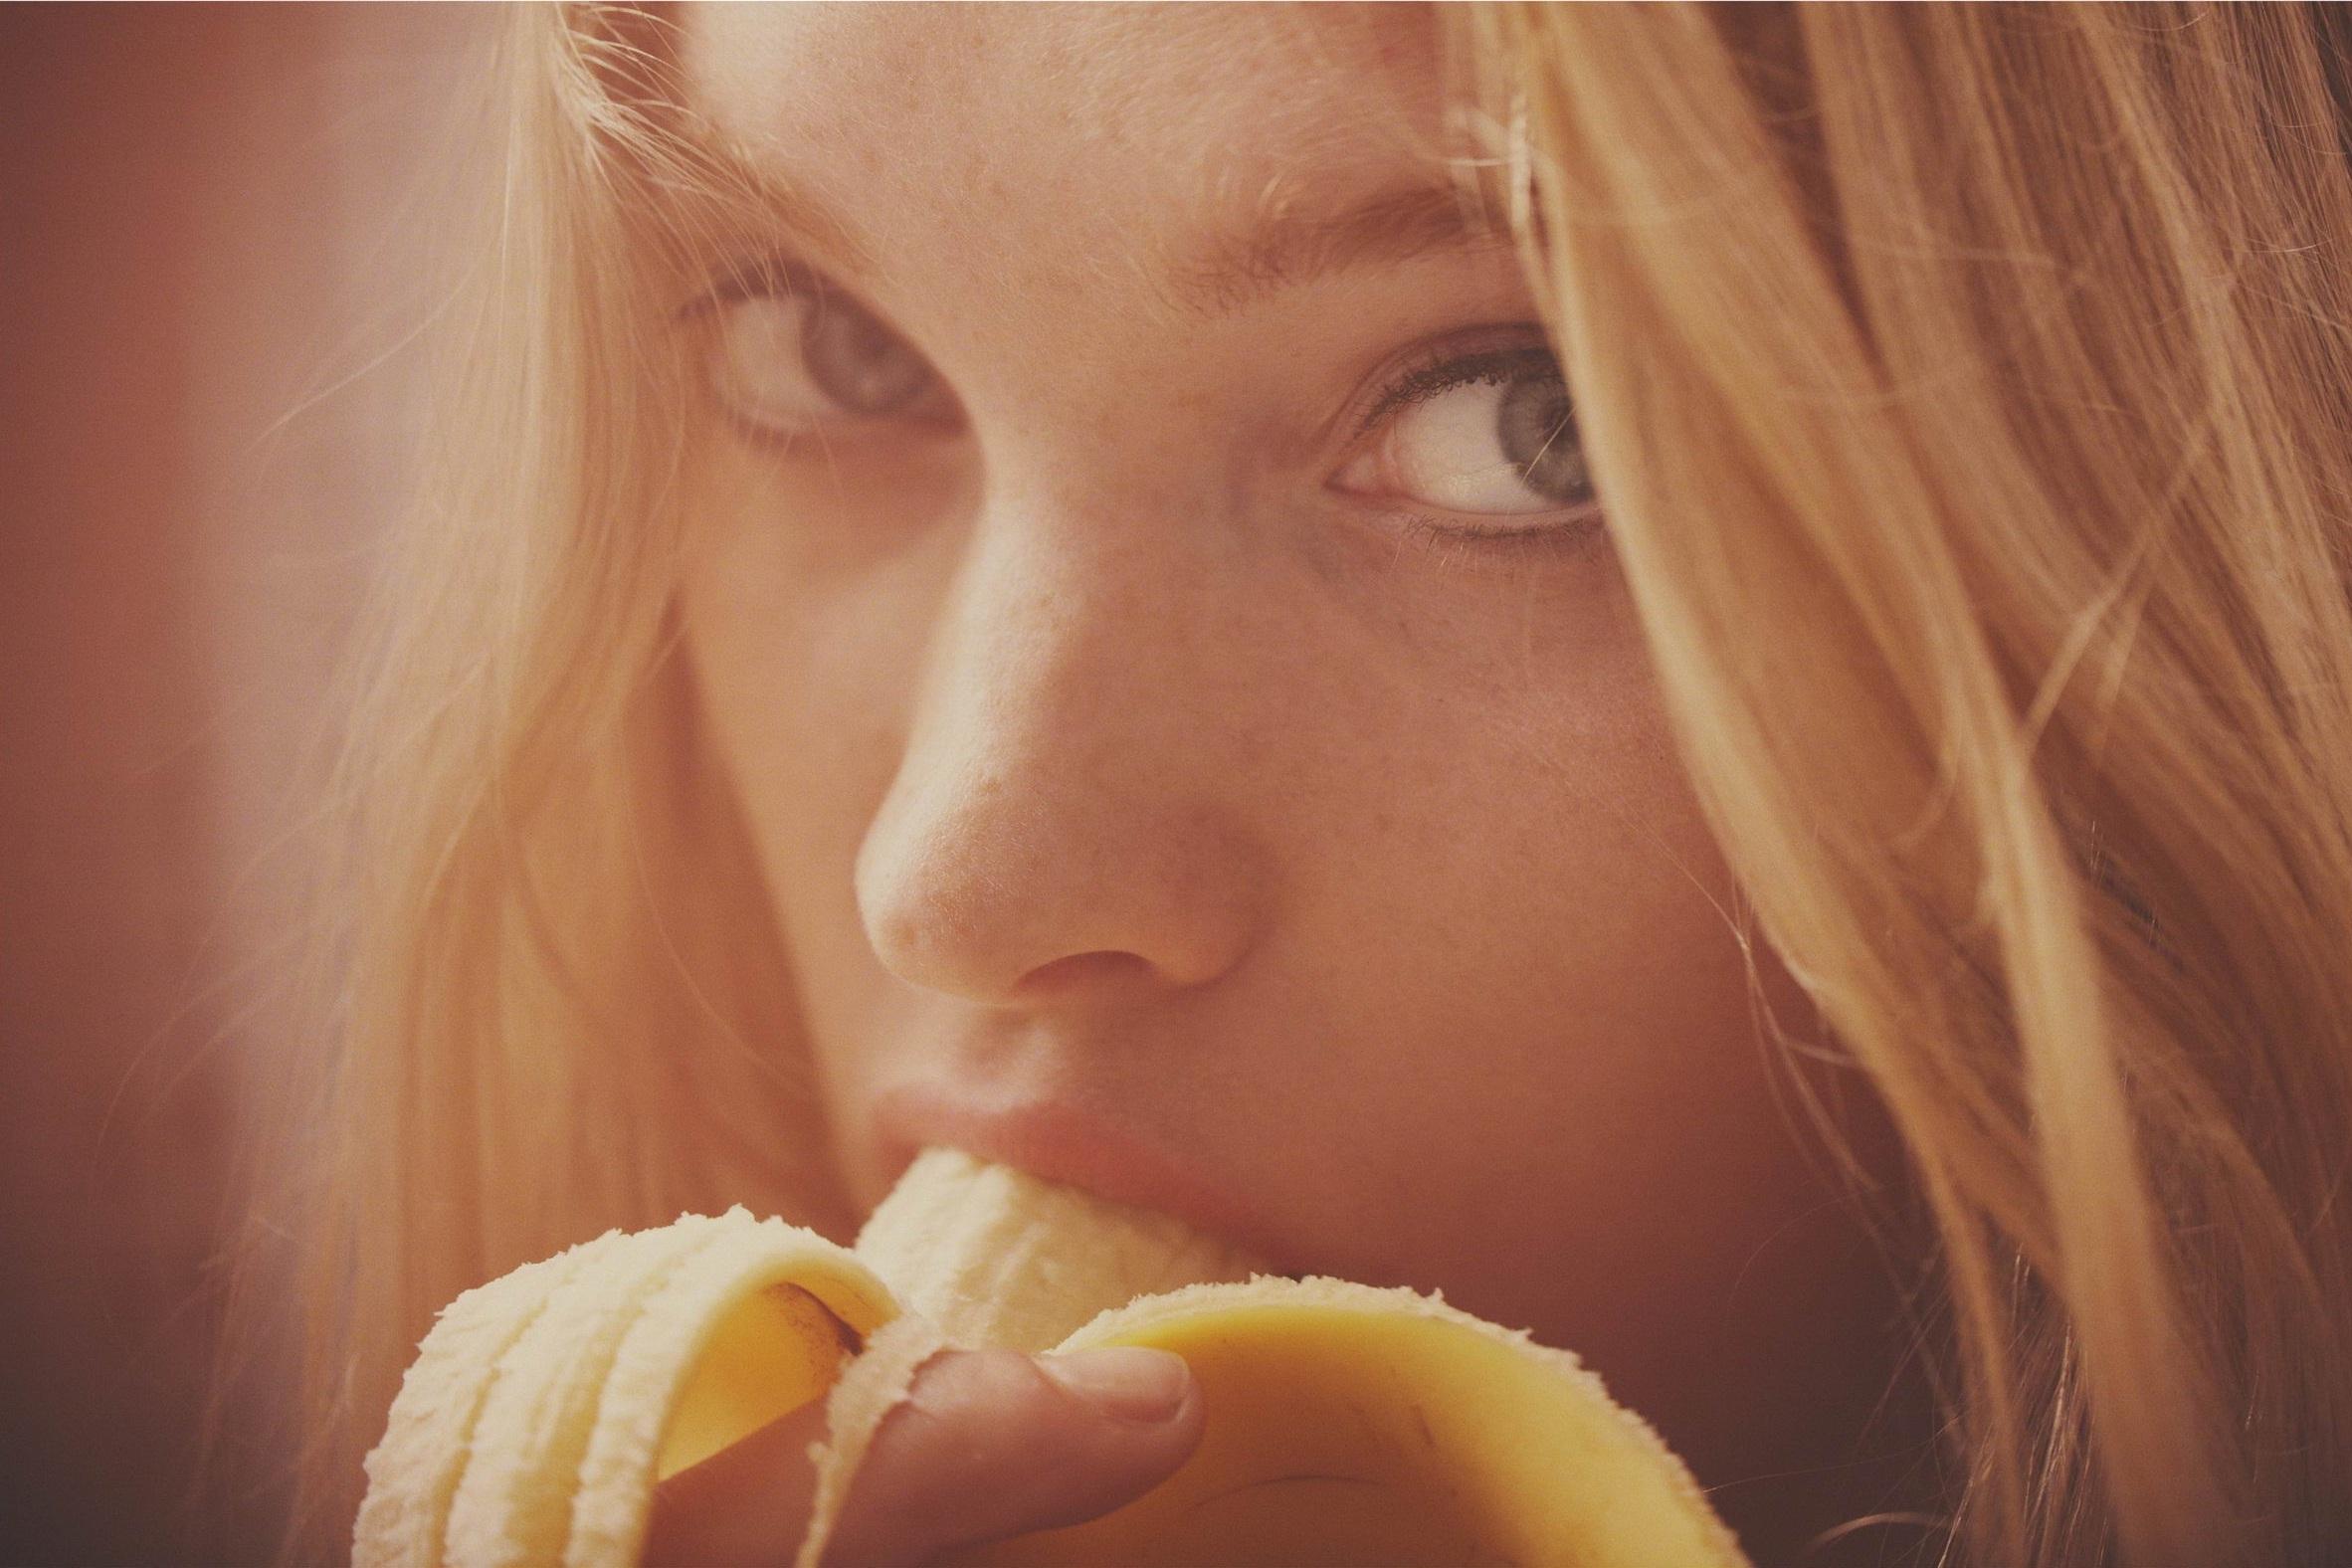 People 2364x1576 Elsa Hosk bananas blonde women phallic symbol